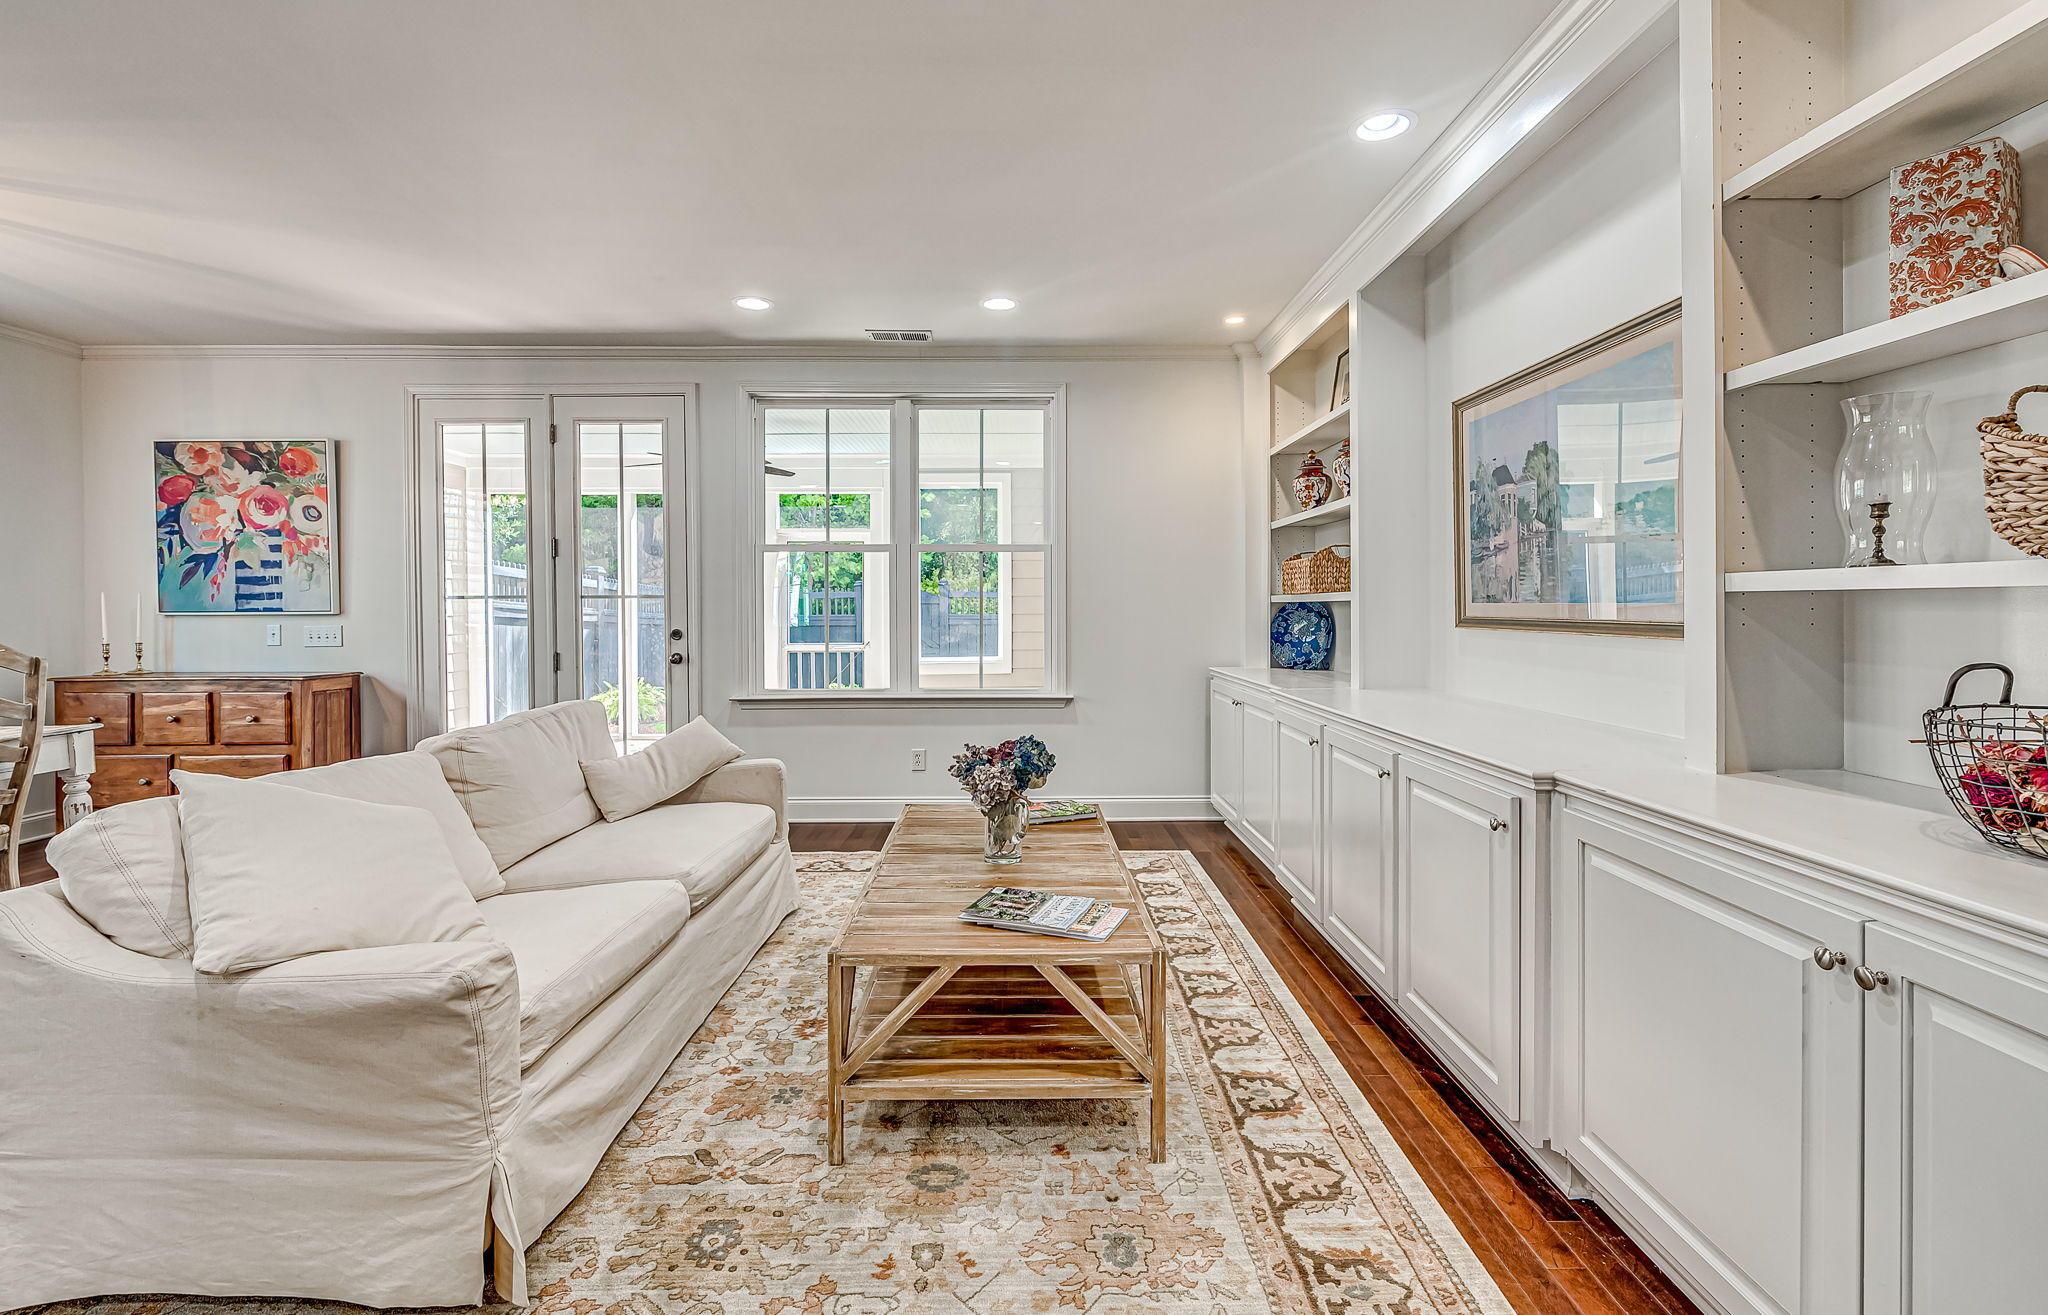 Dunes West Homes For Sale - 2476 Kings Gate, Mount Pleasant, SC - 26